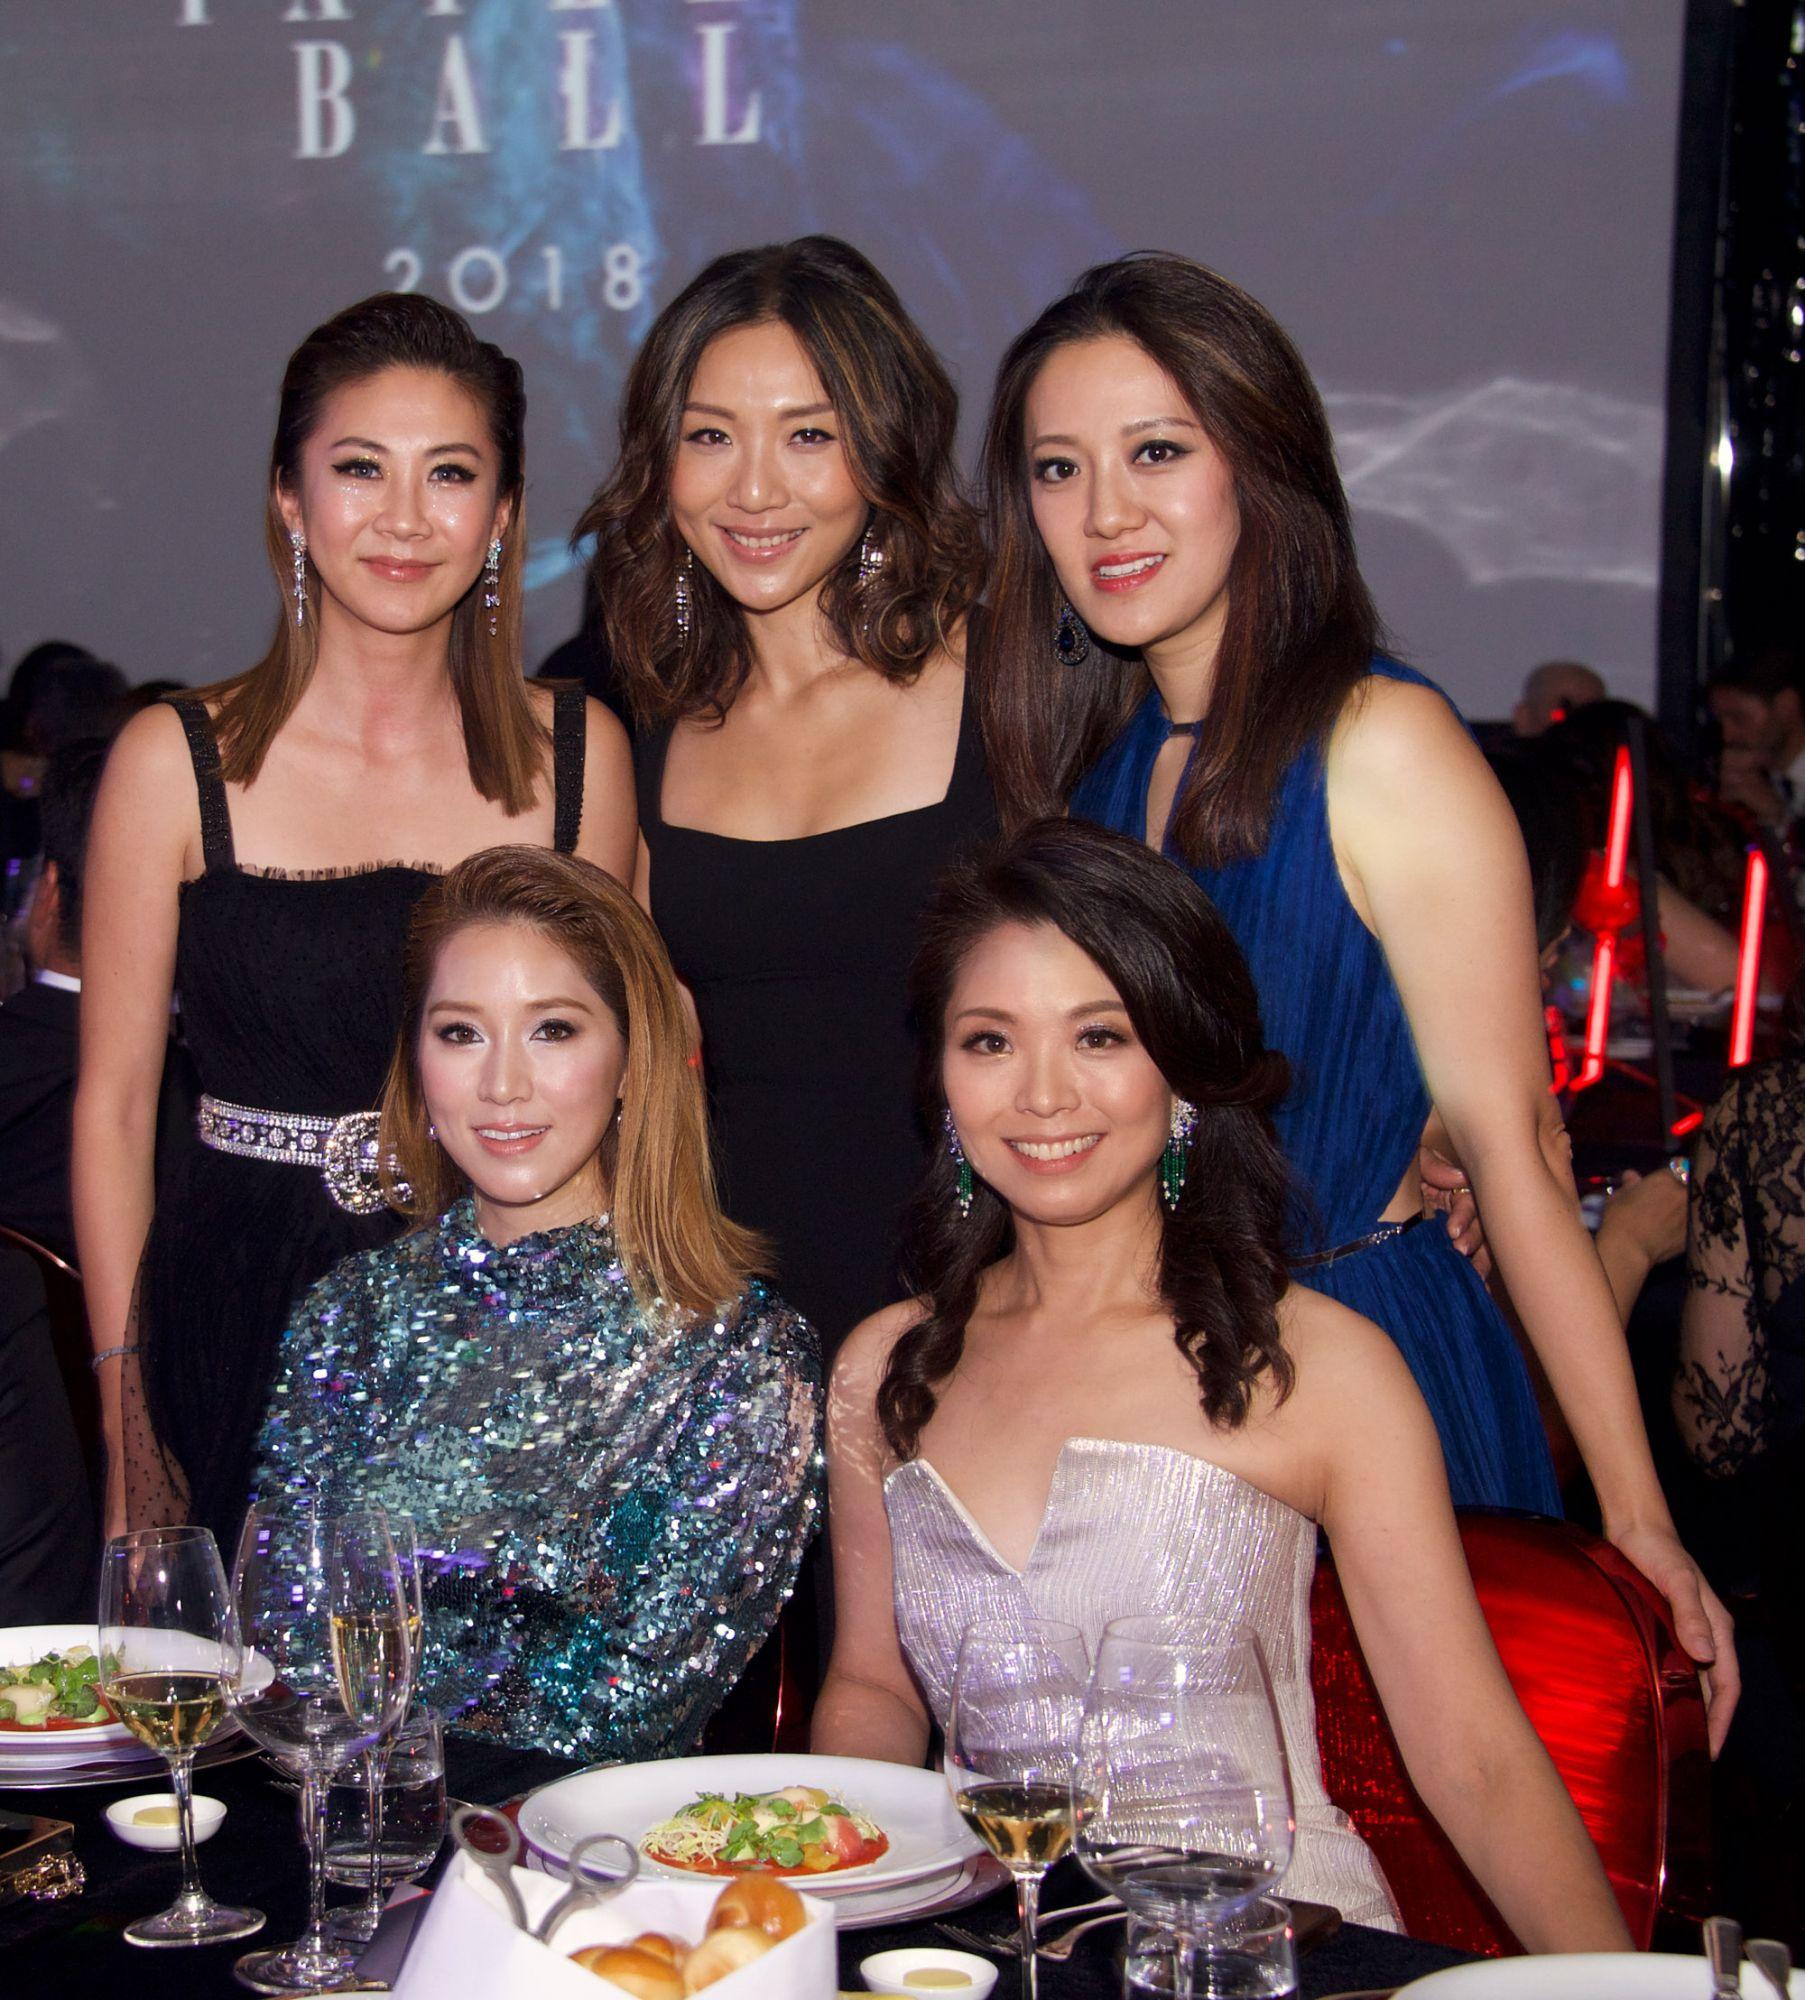 Standing - Adrienne Hui, Jacqueline Sun, Jenny Chau. Seated - Cathy Lee, Anne Wang-Liu